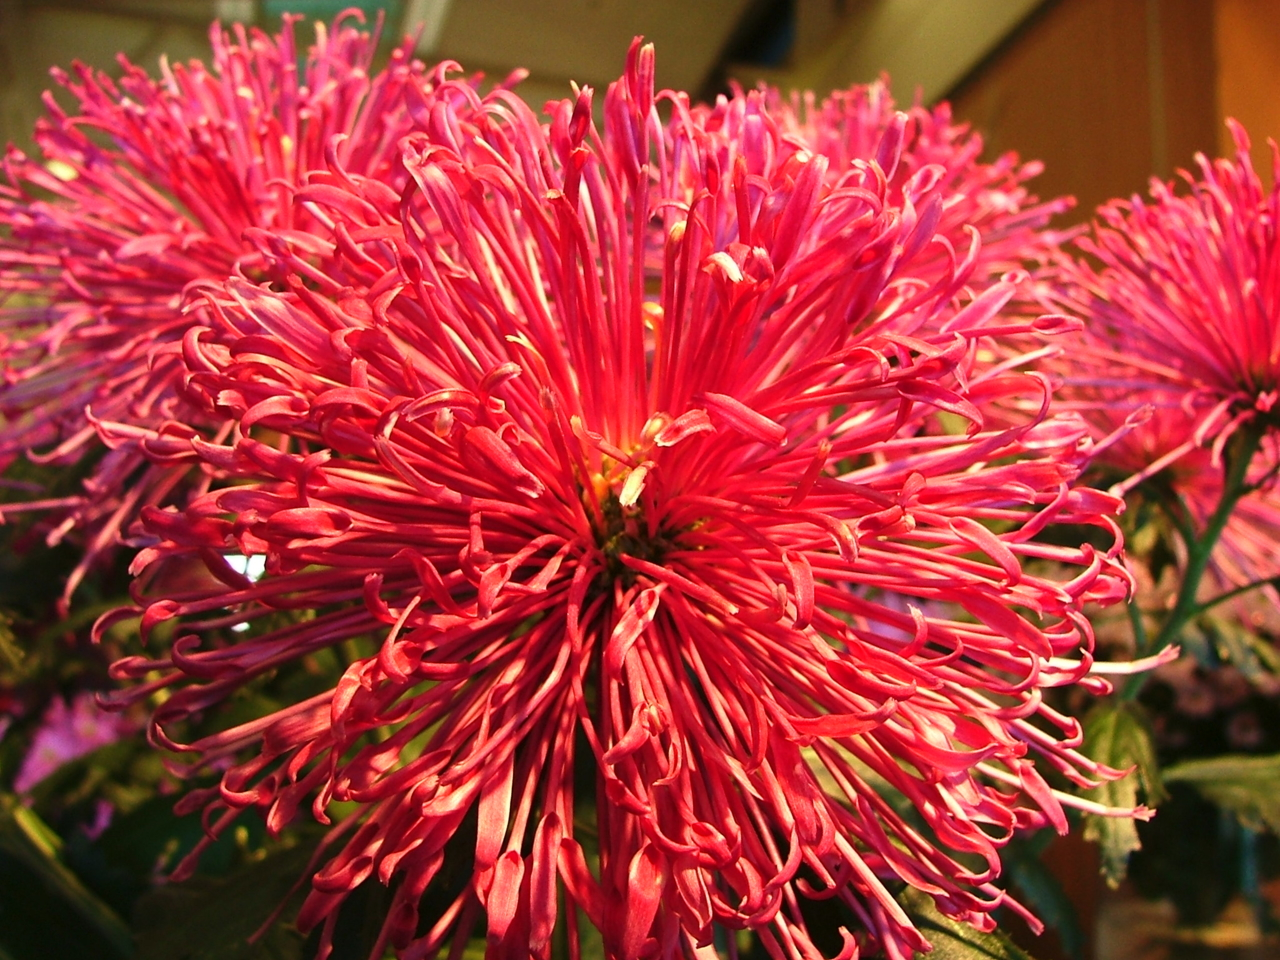 DSCF1473 ดอกไม้ชนิดนี้เหมือน ดอกเข็มบ้านเรานะ..